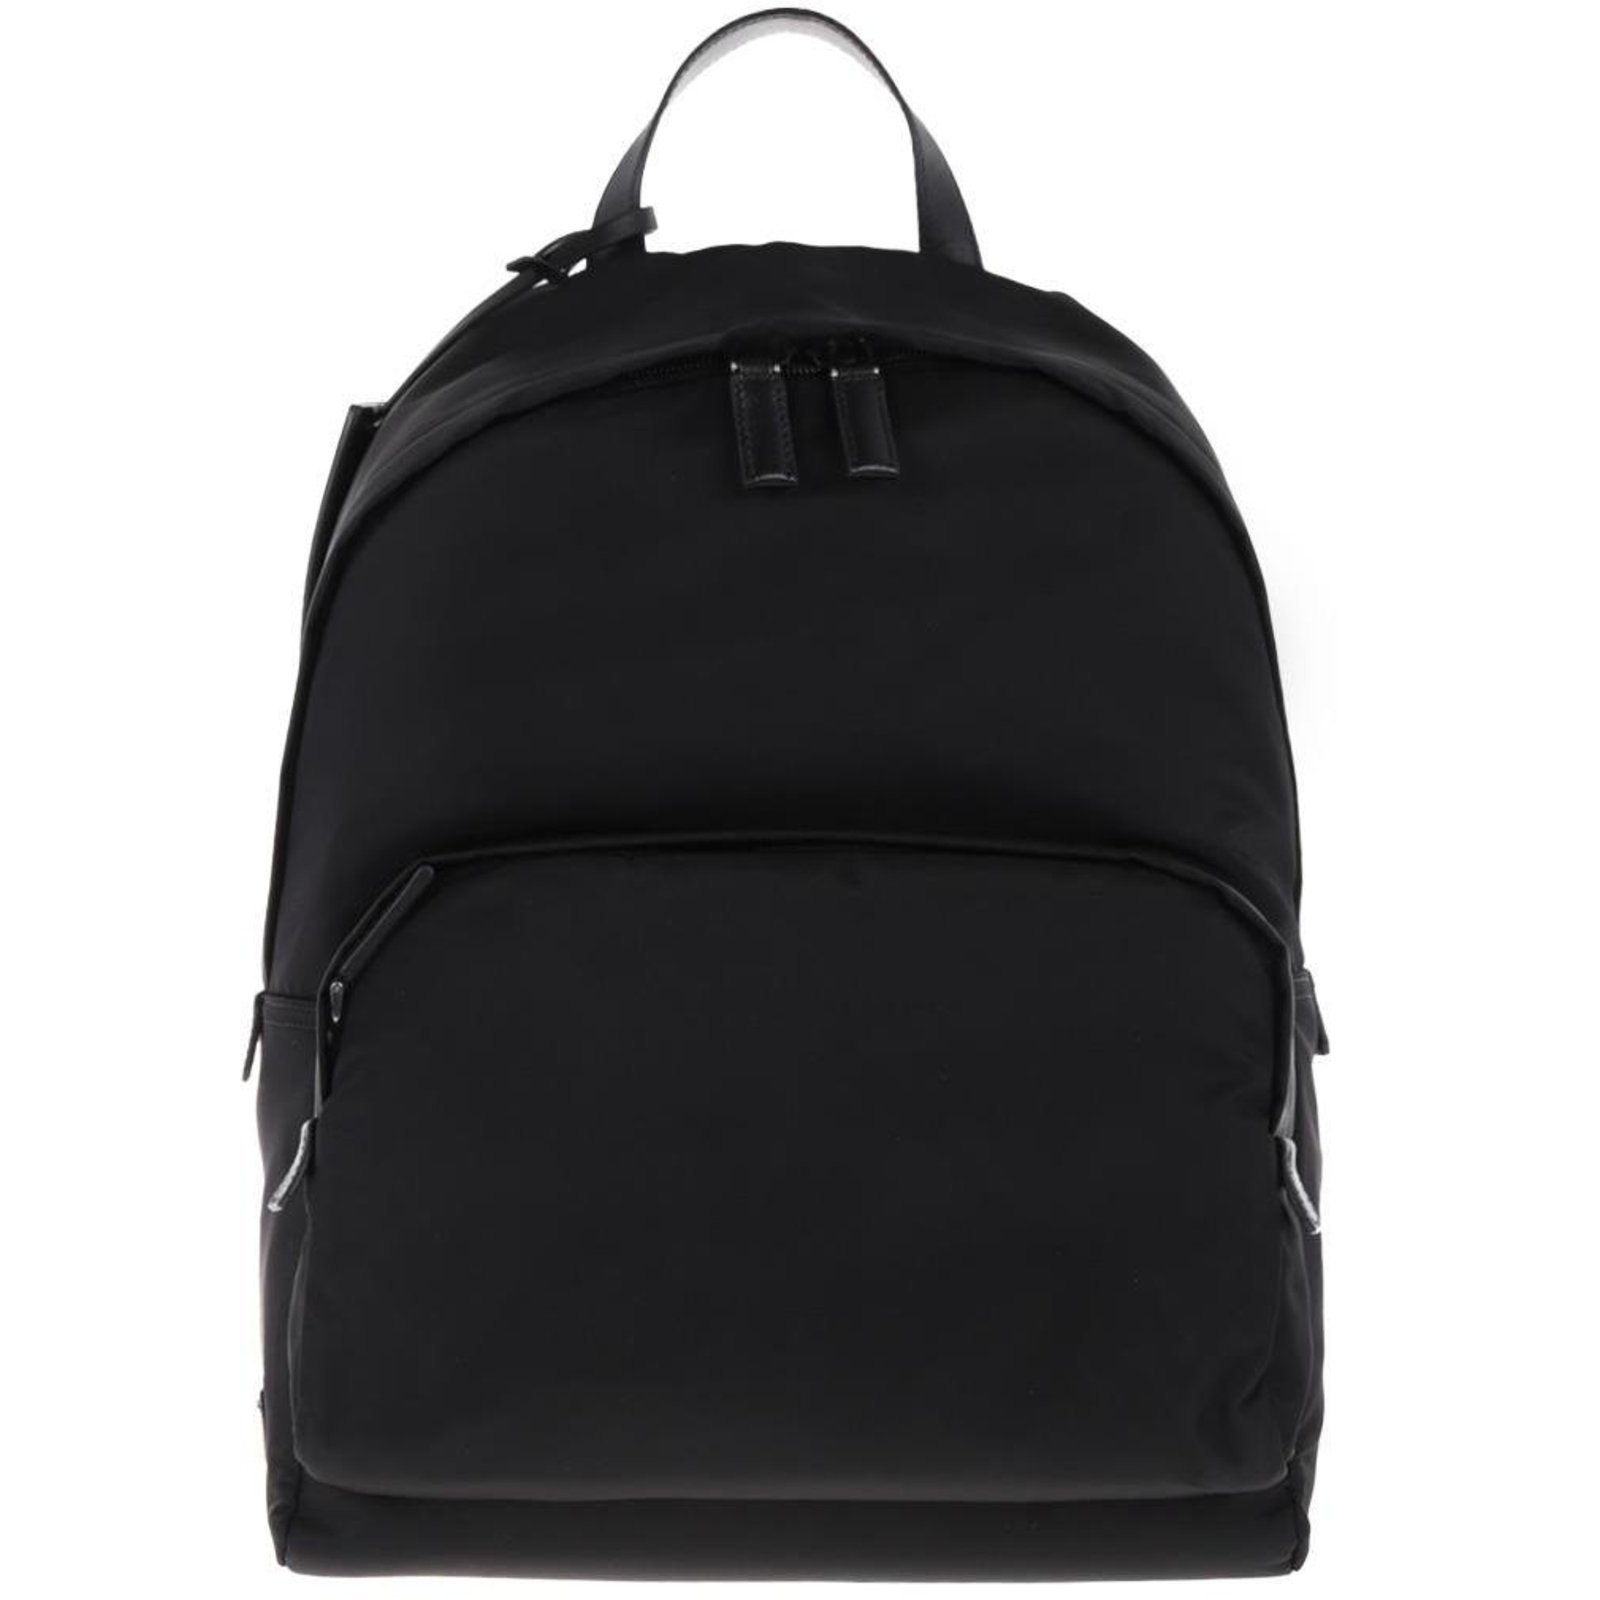 ef77033b4a0c Prada Backpack Bags Briefcases Nylon Black ref.88274 - Joli Closet